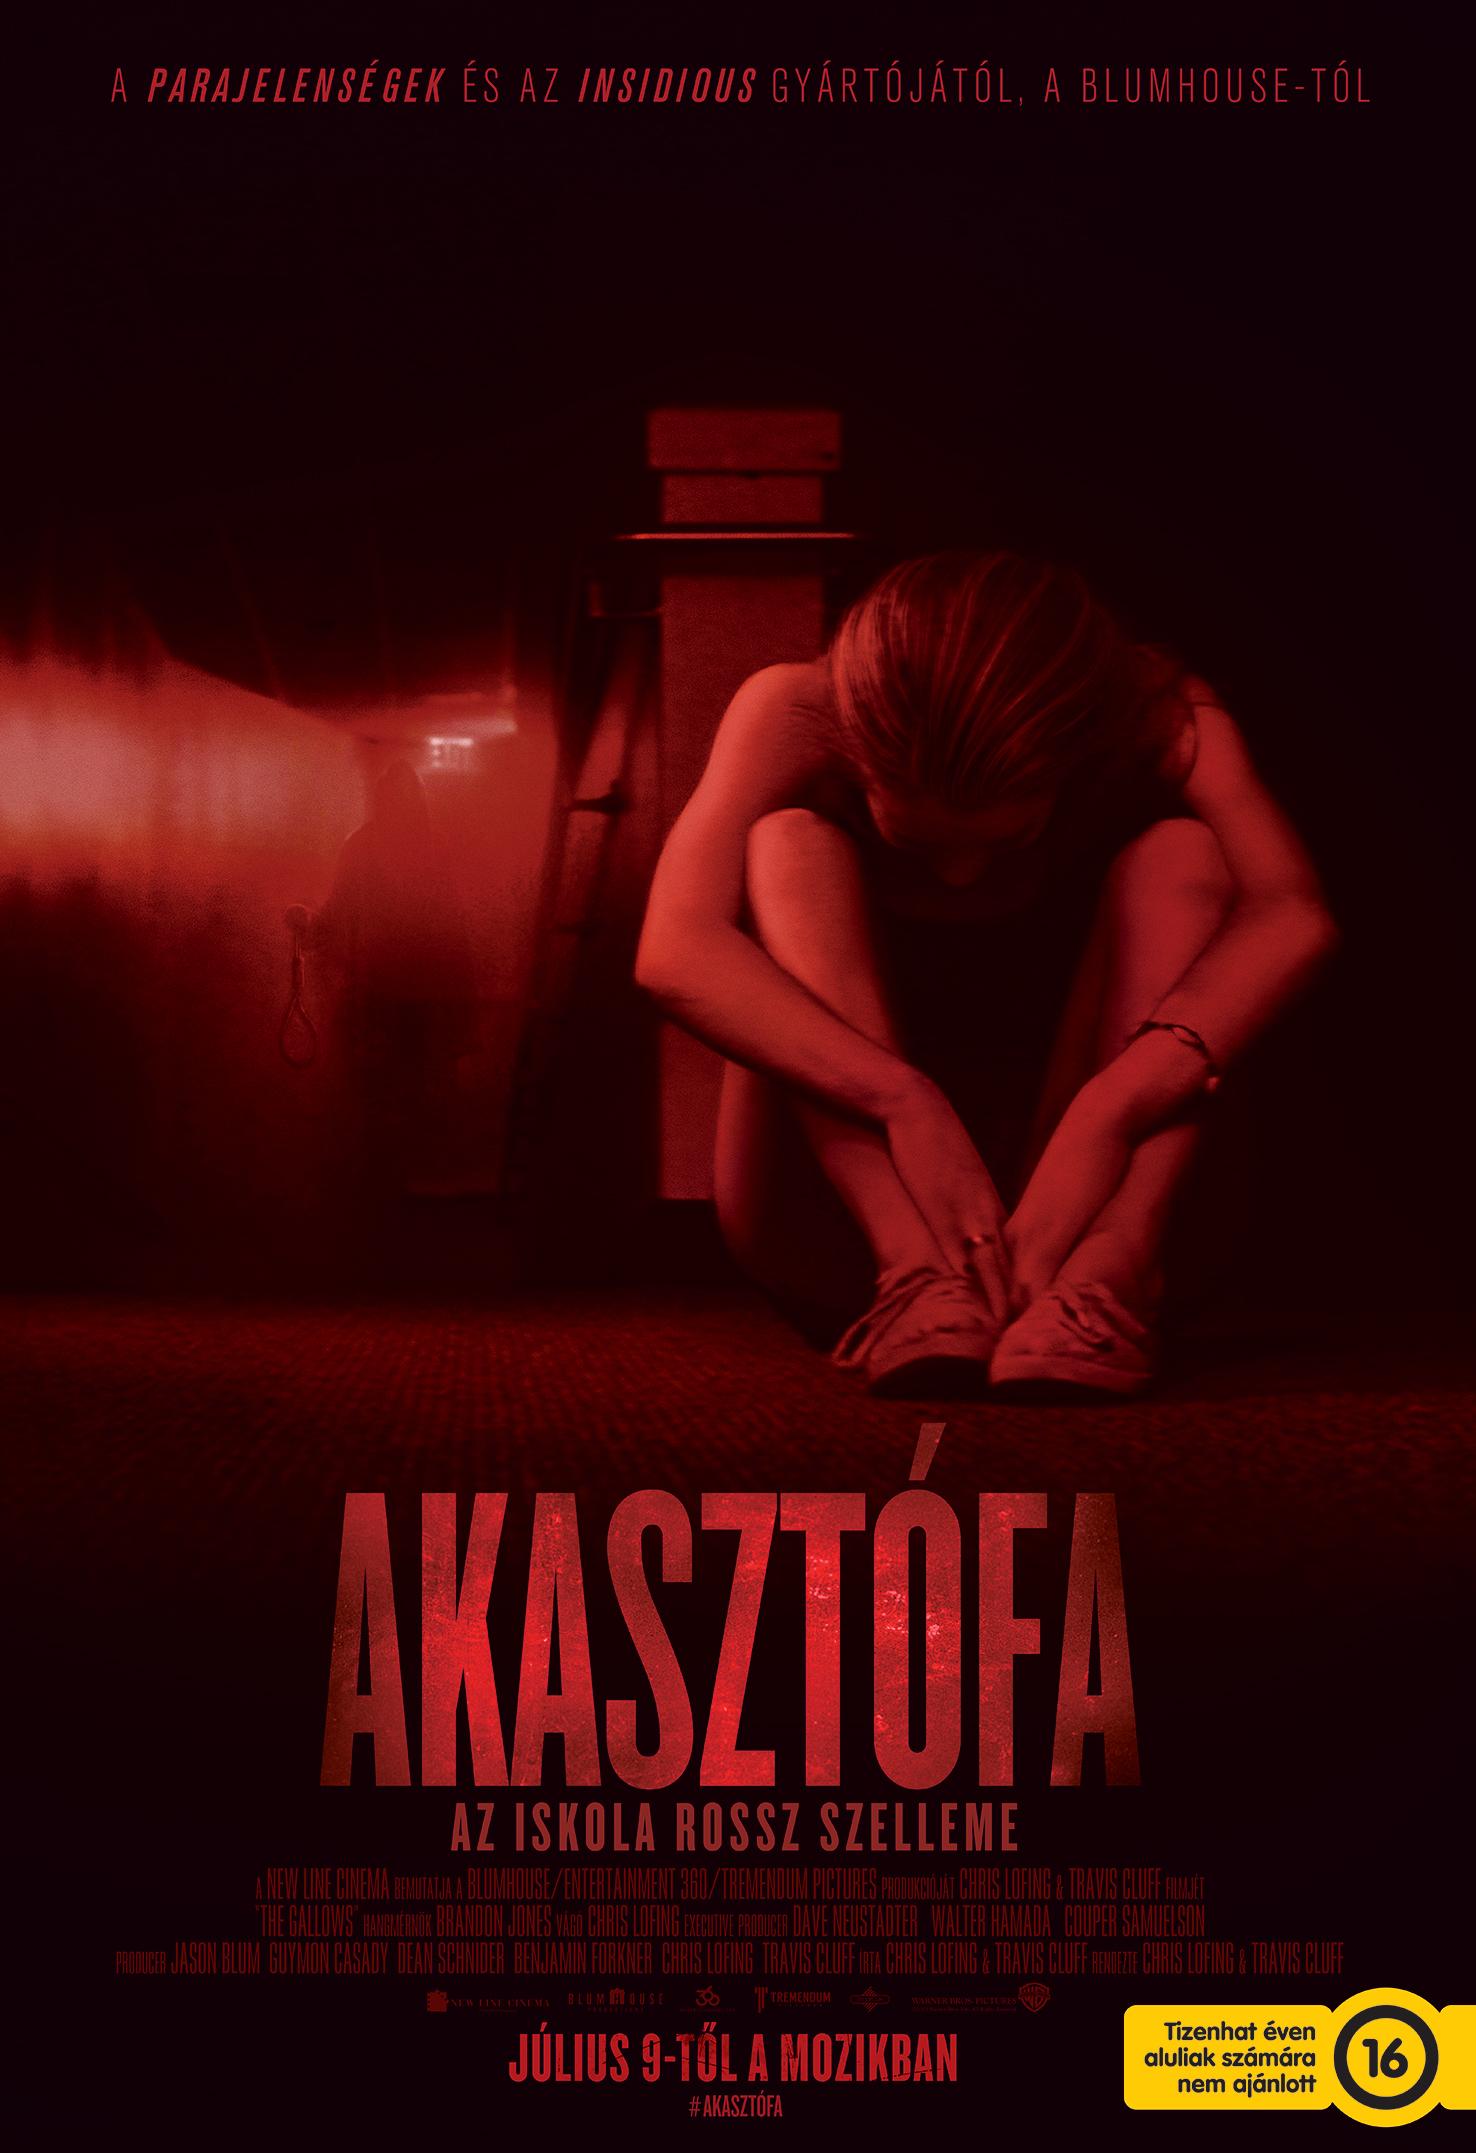 Akasztofa_B1plakat_68x98_1